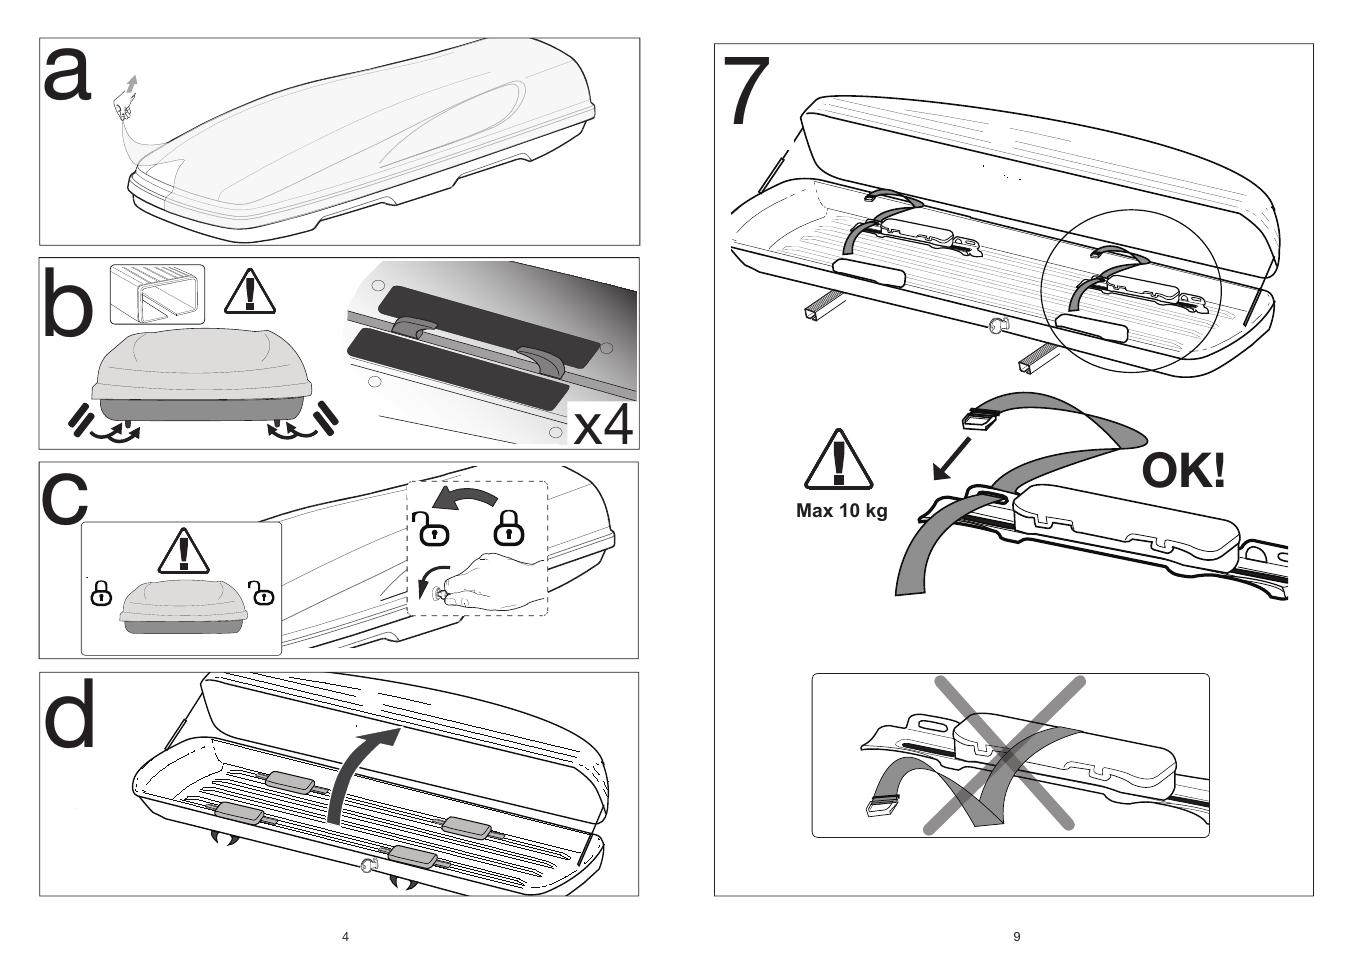 Triton manuals